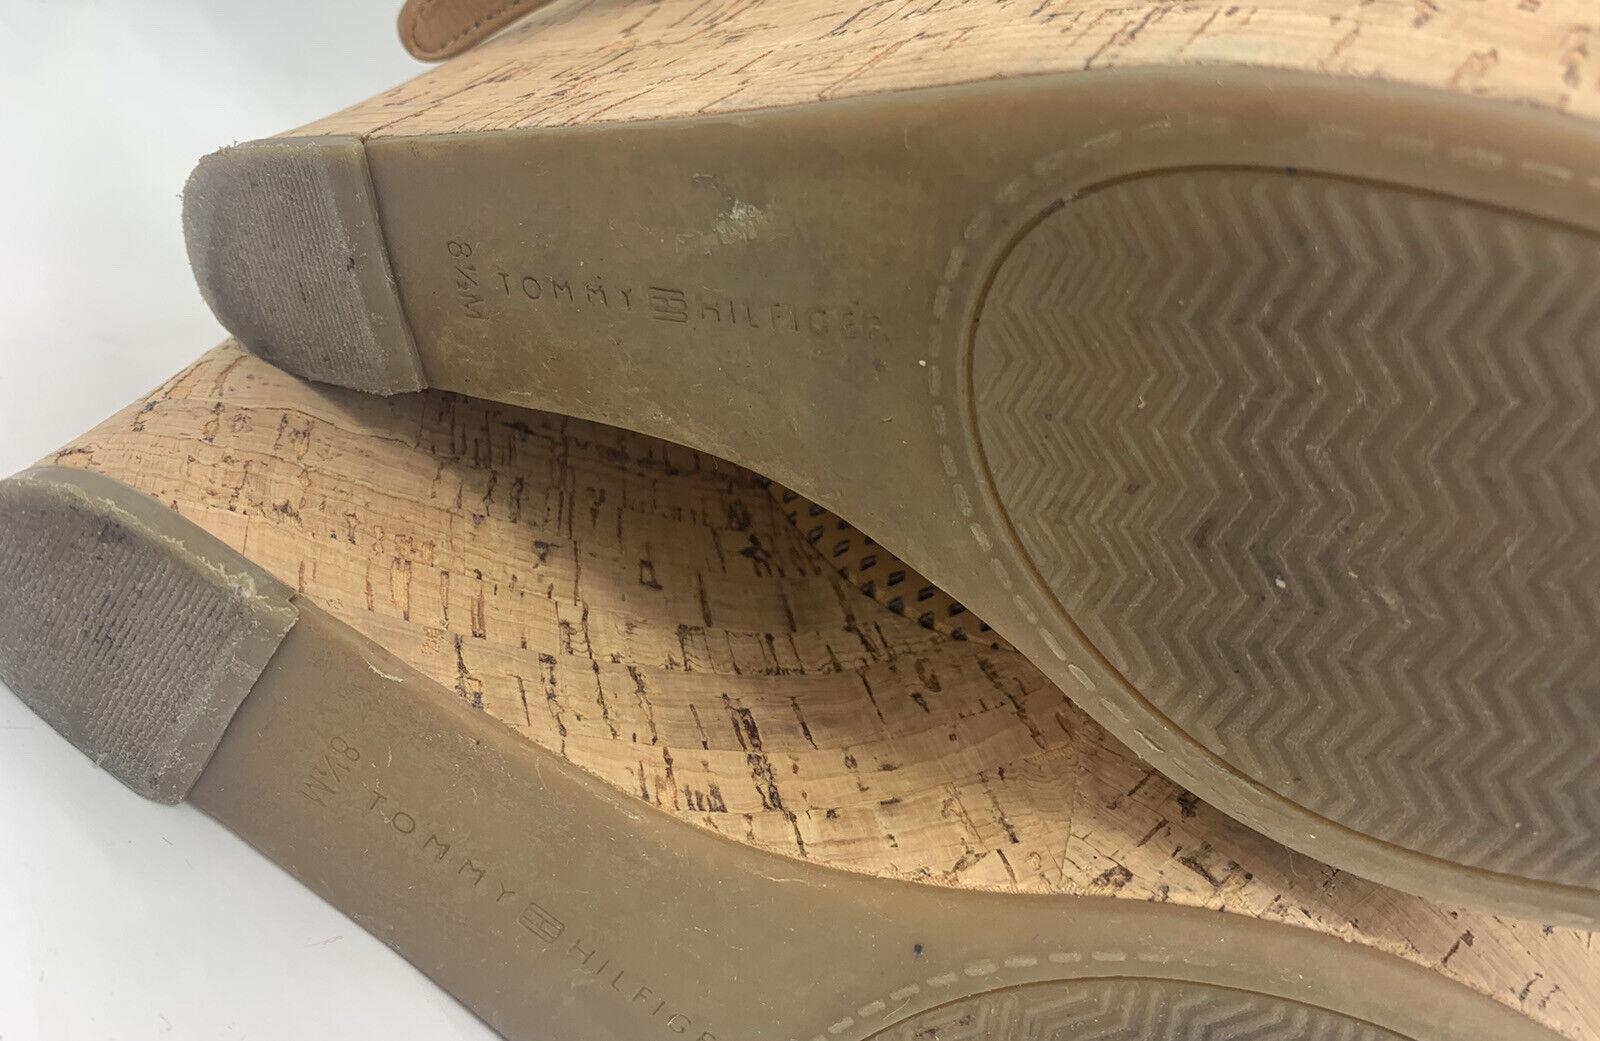 Tommy Hilfiger Size 8.5 M Tan Leather Cork Wedges - image 7